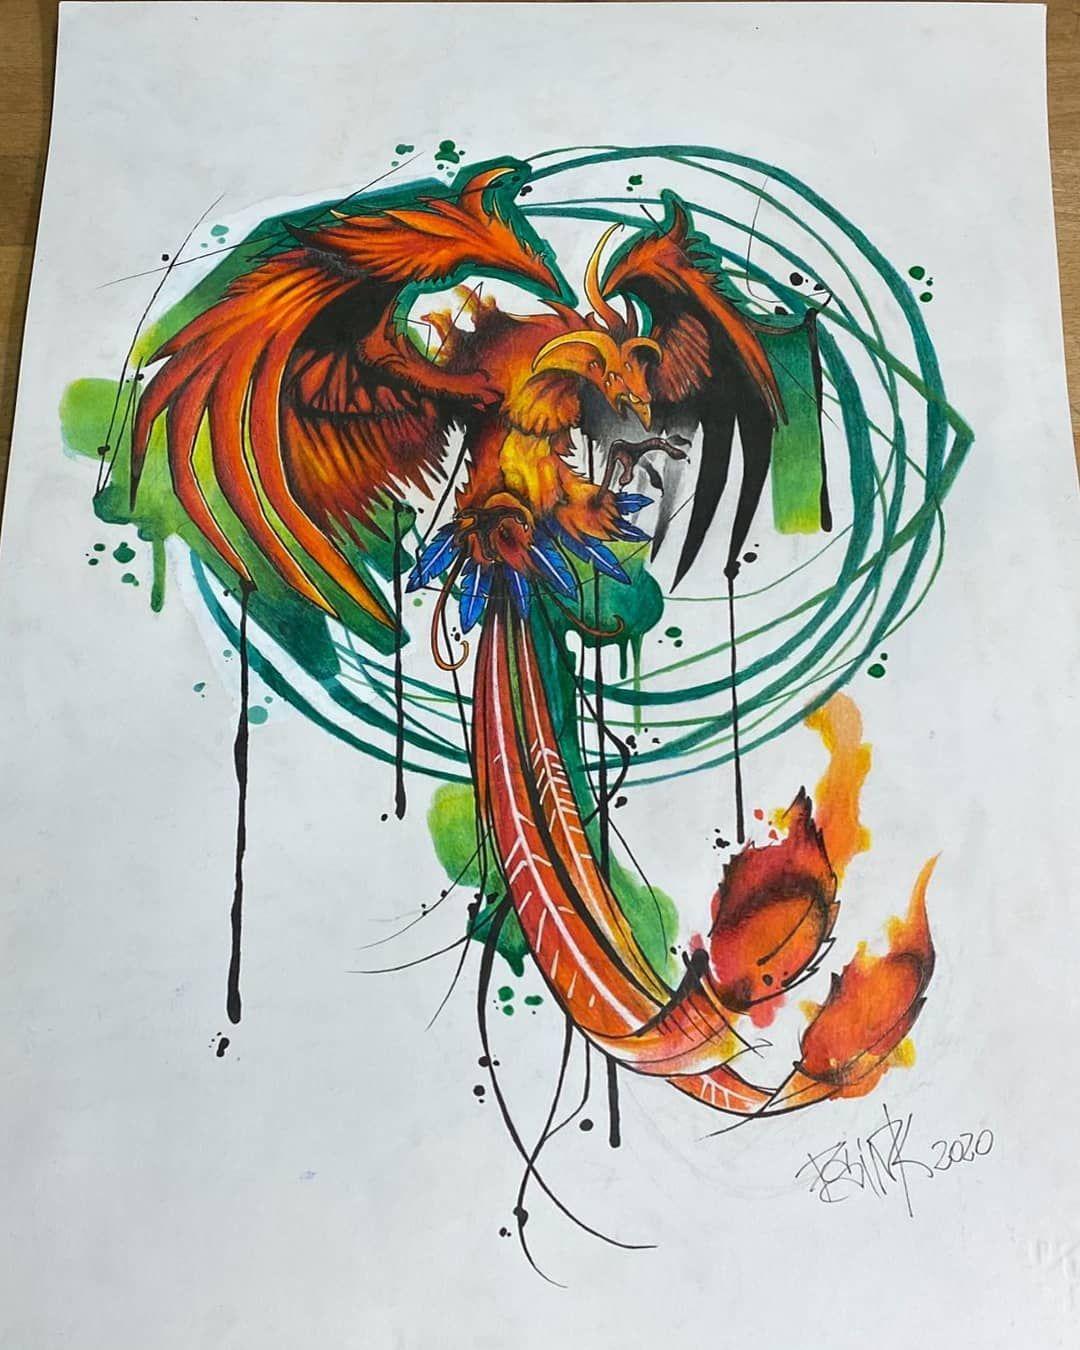 Rinasceremo.... #tattooworld #tattooer #tattooed #tattooing #tattoo2me #watercolor #watercolortattoo #watercoloring #wctattoos #tattooink #tattooitalia #palermo #tattoopalermo #tattooart #phoenix #siciliatattoo #avantgardetattoo #thebesttattooartists #inkedup #inkstagram #ink #inked #inkedmag #insta4like #amazingink #instatattoo #sleevetattoo #cartoon #tattooistartmagazine